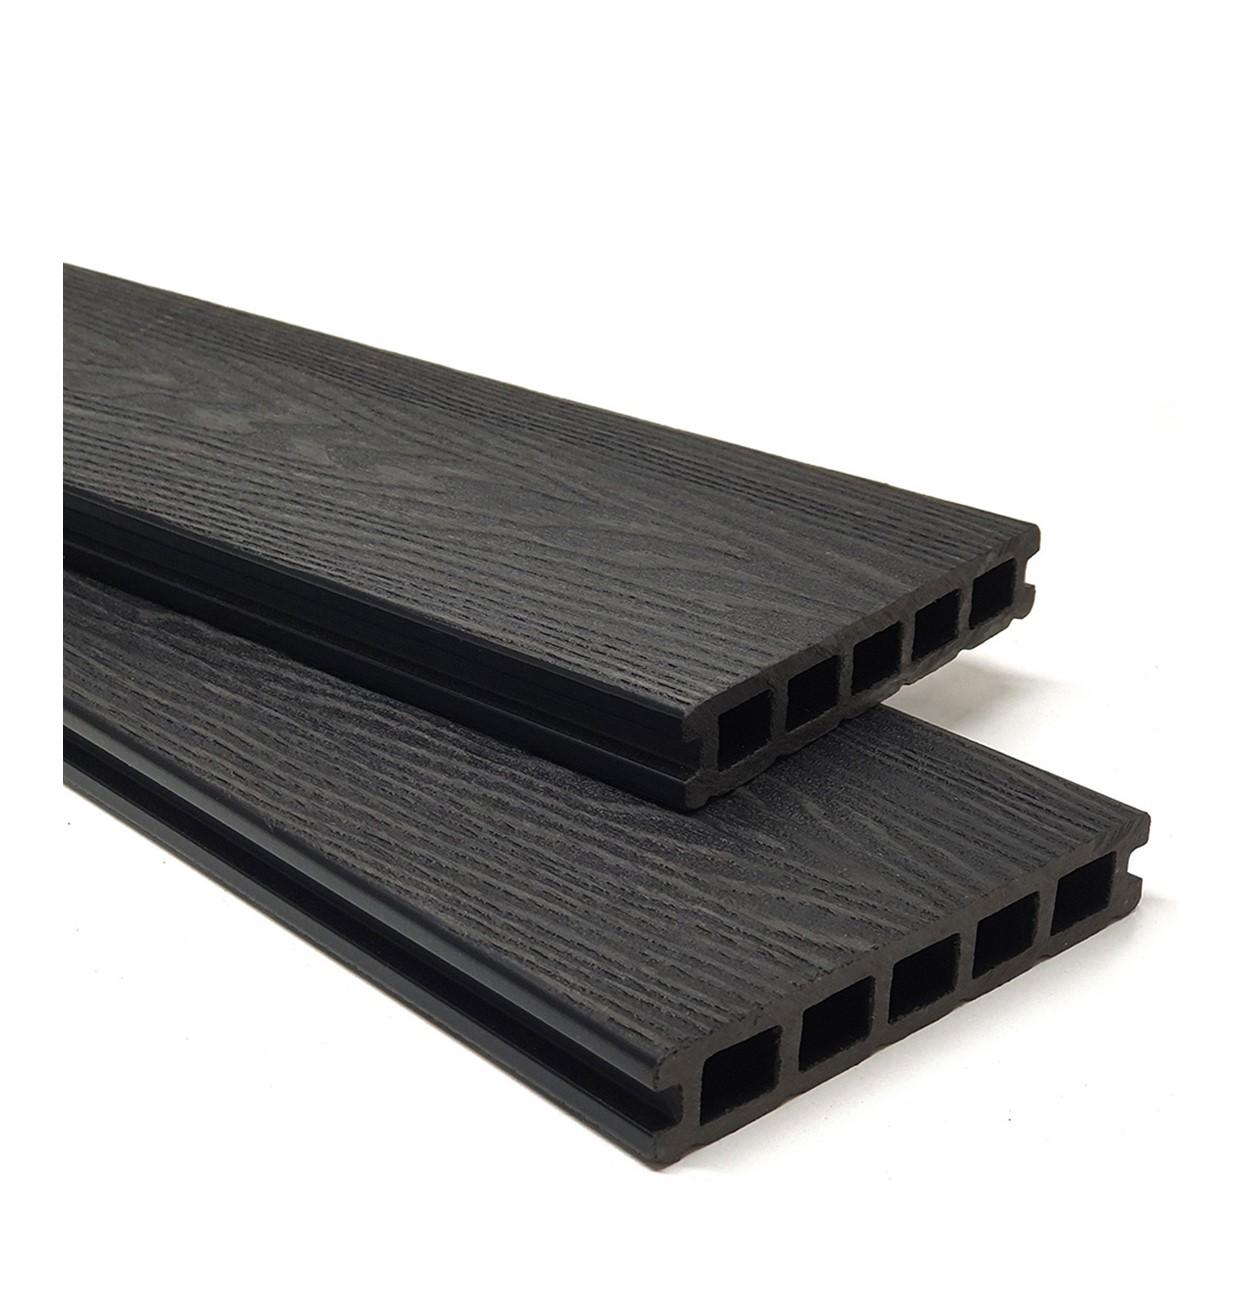 Charcoal Black Wood Grain Composite Decking Kit 3.6m Boards (Reversible)